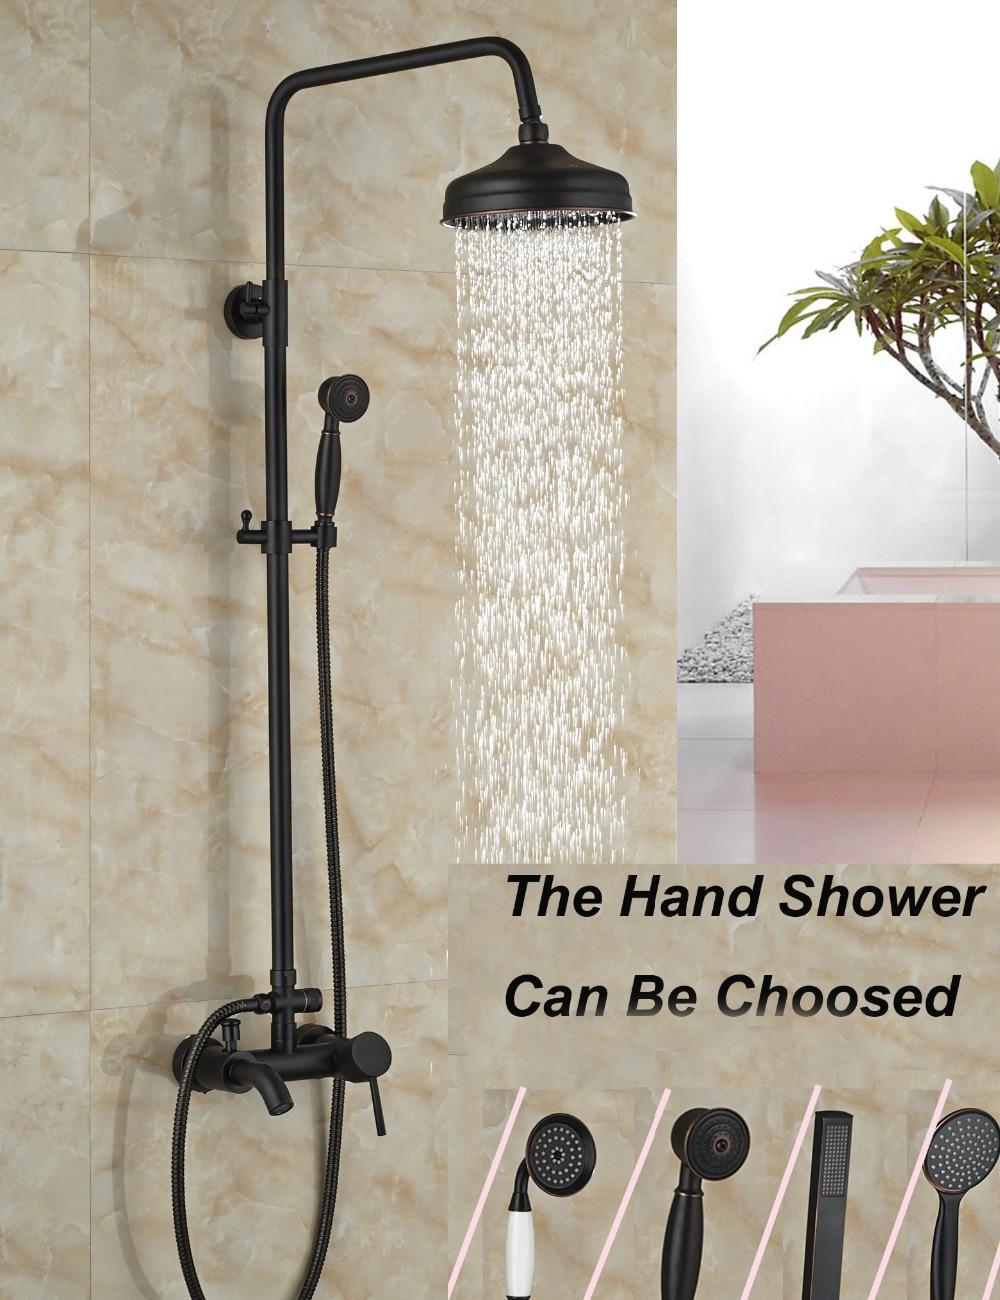 Wholesale And Retail Luxury Oil Rubbed Bronze 8 Round Rain Shower Head Tub Spout Valve Mixer Tap W/ Hand Sprayer